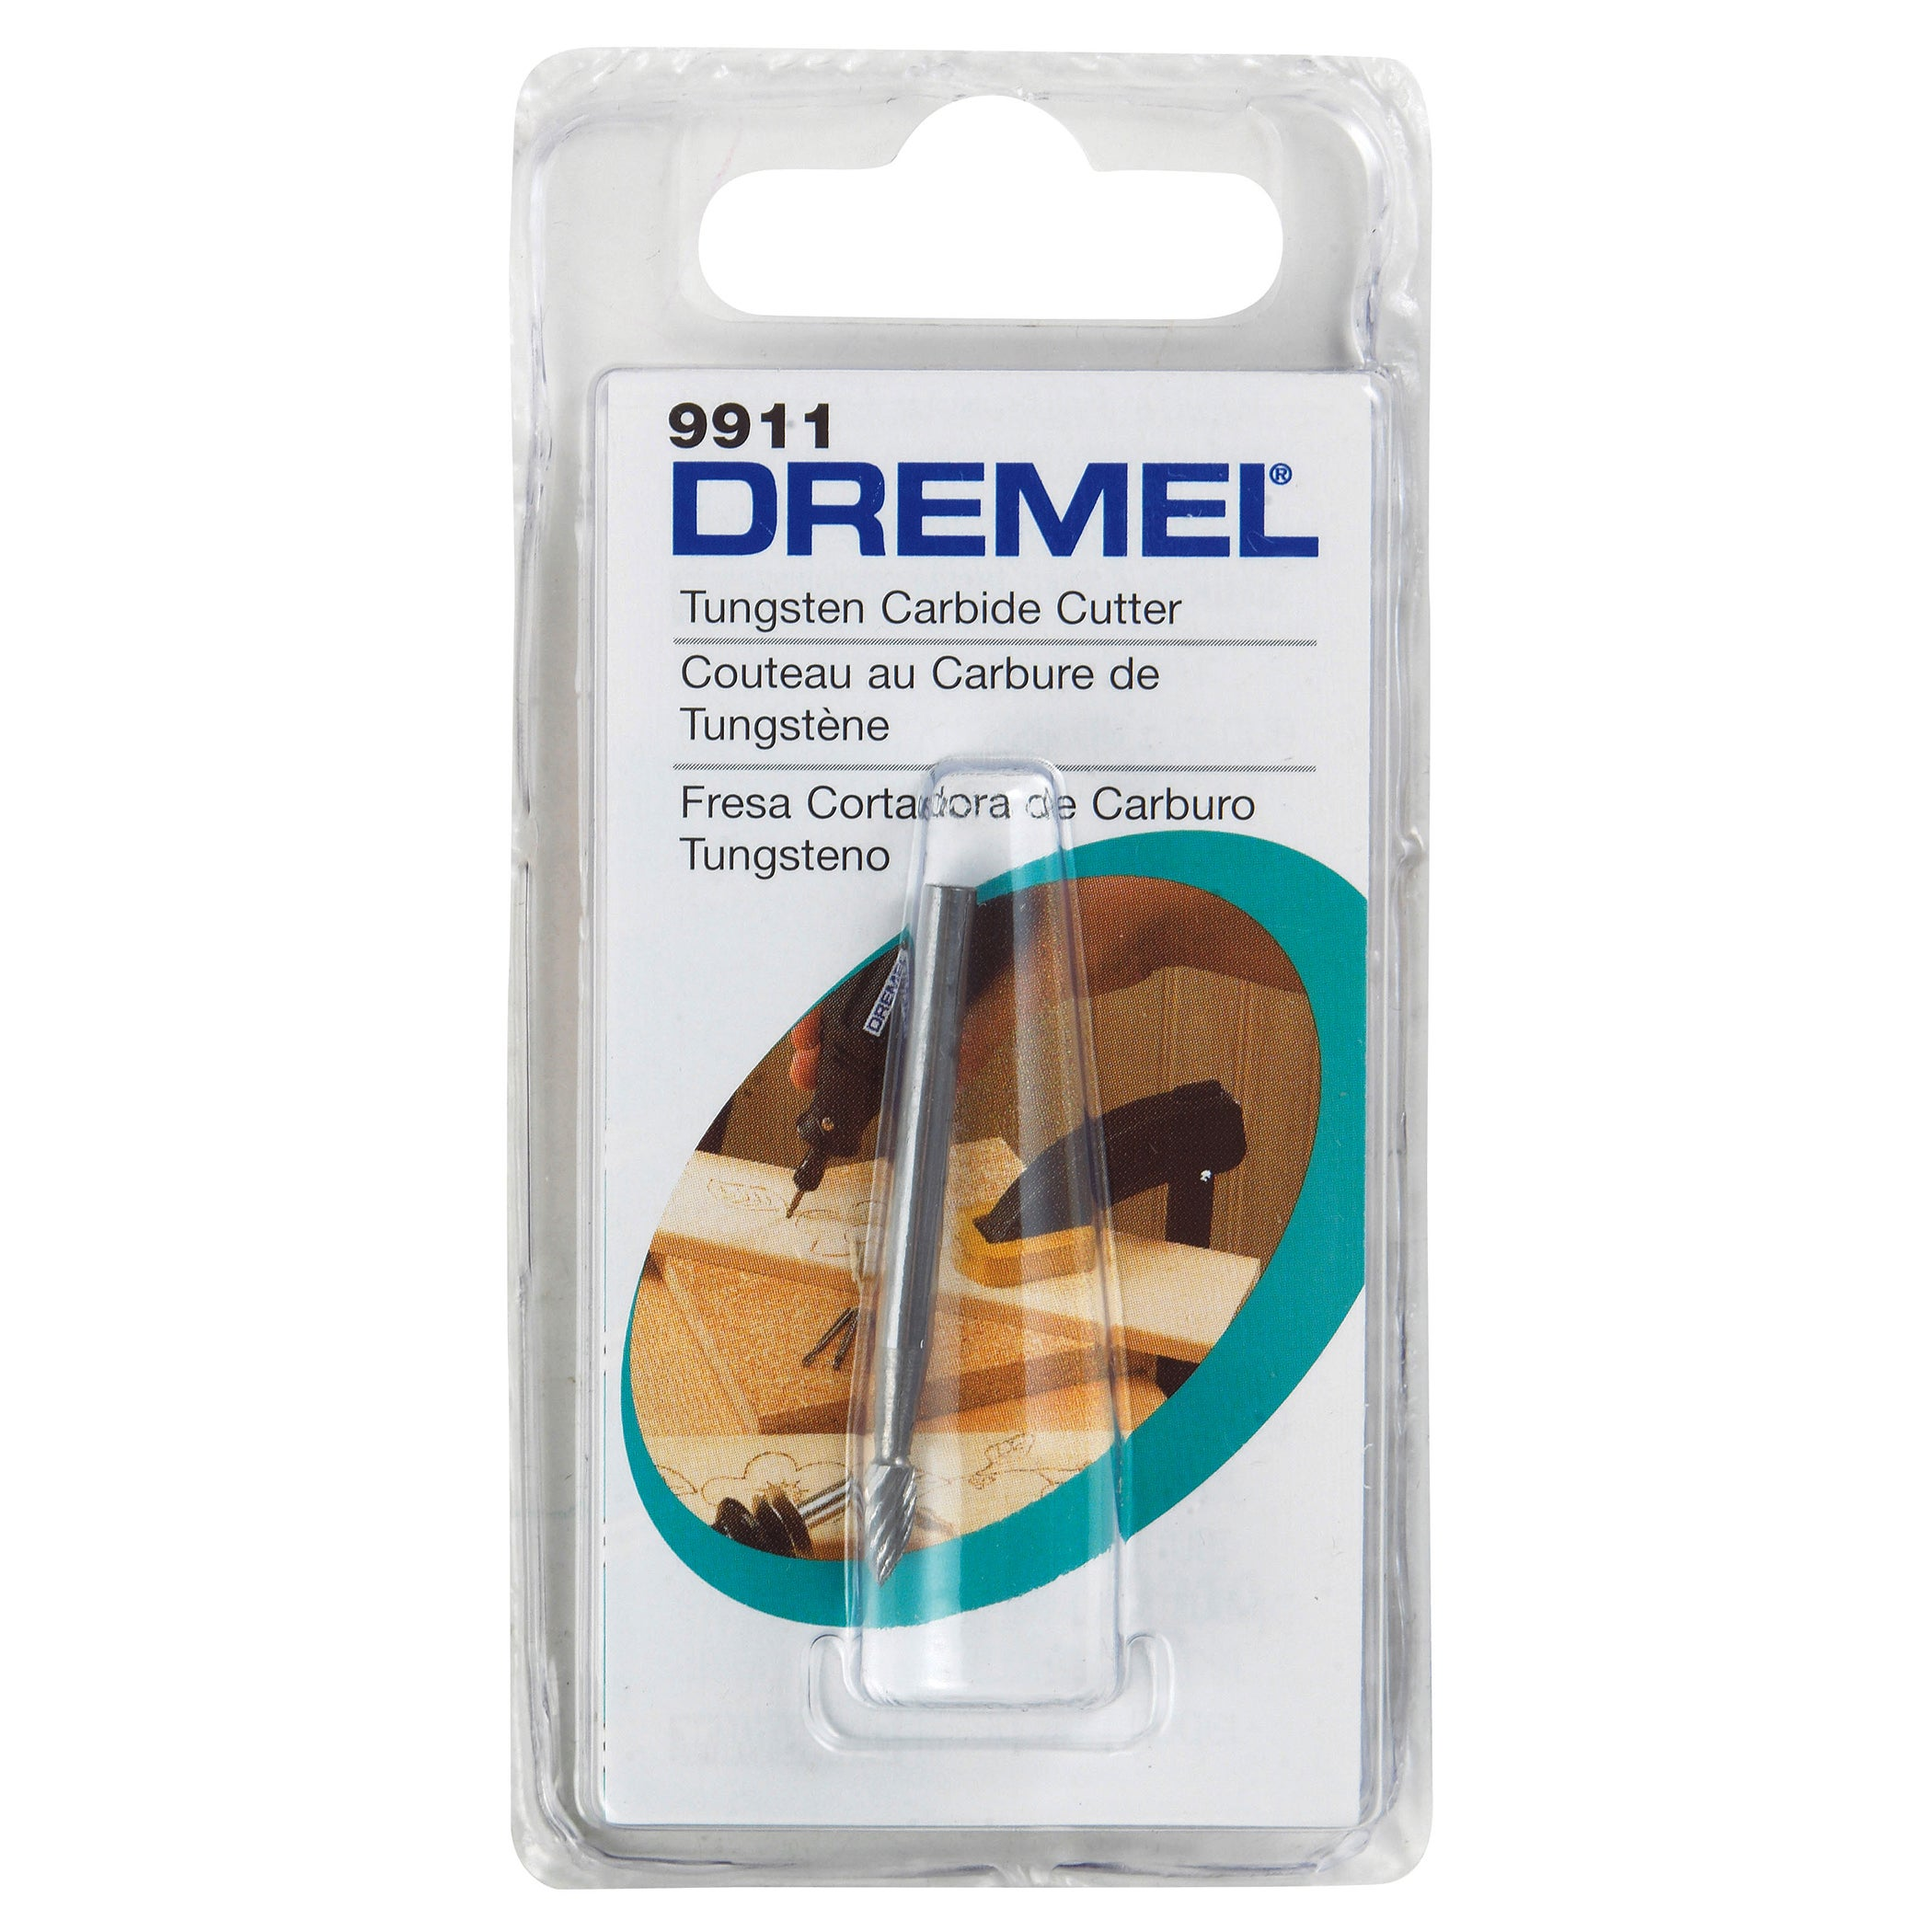 Dremel 9911 0.125-inch Tungsten Carbide Cutter (Power tool accessories)